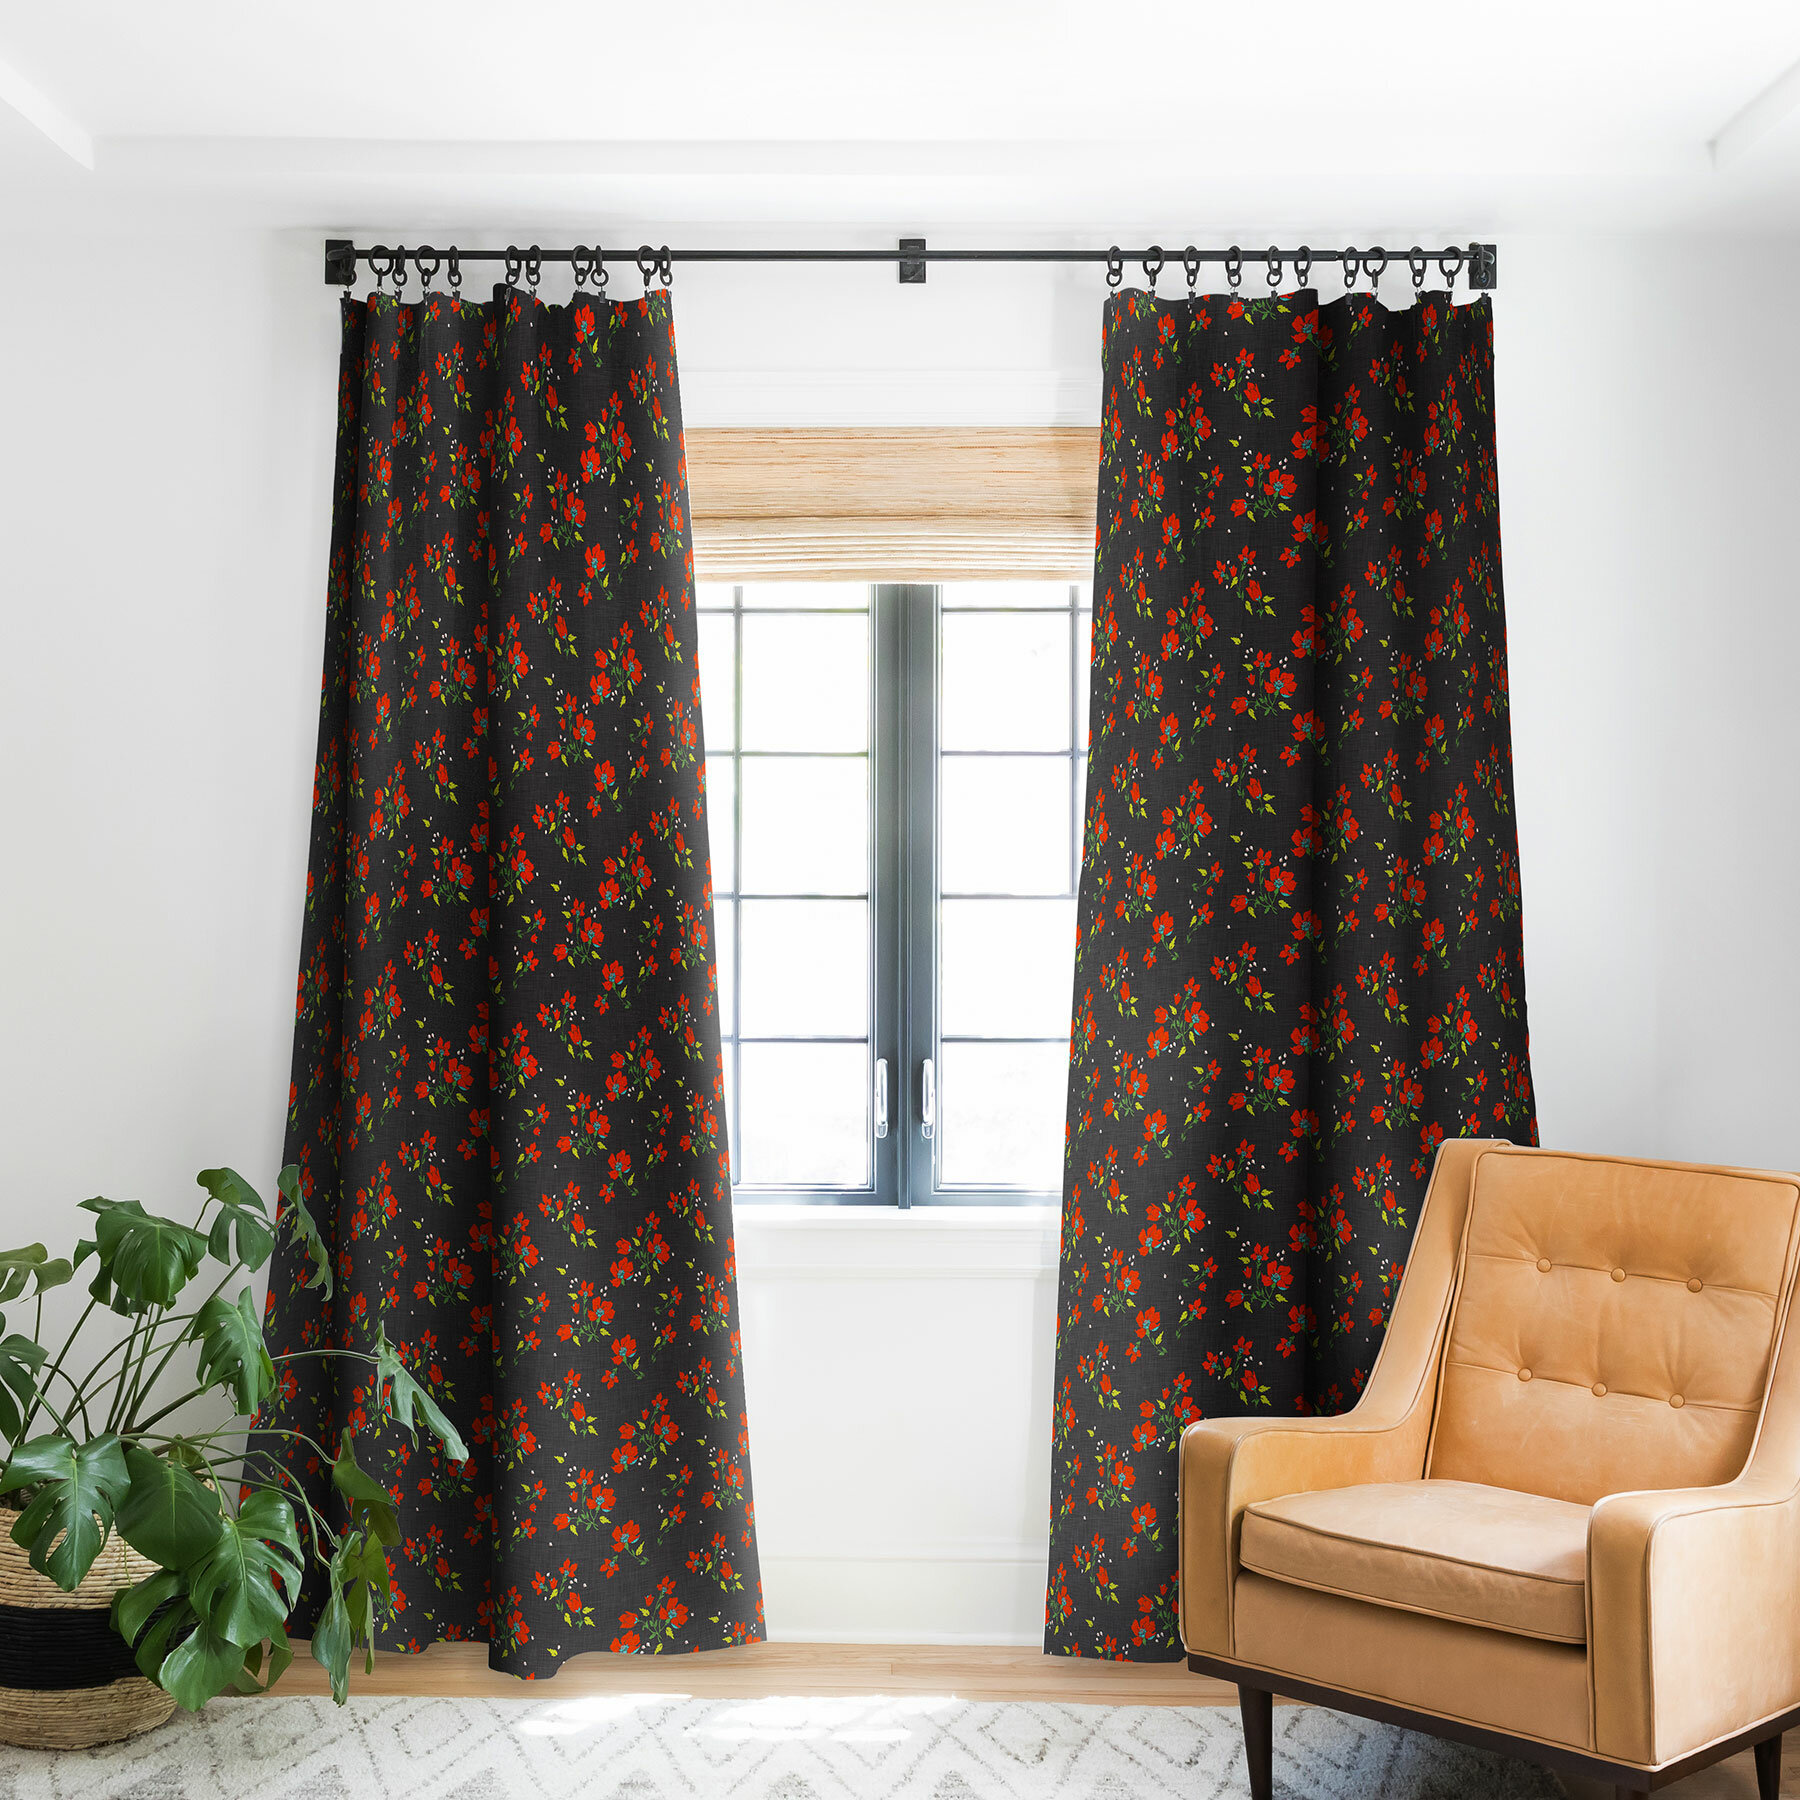 East Urban Home Holli Zollinger Bohemian Farmhouse Floral Room Darkening Rod Pocket Single Curtain Panel Wayfair